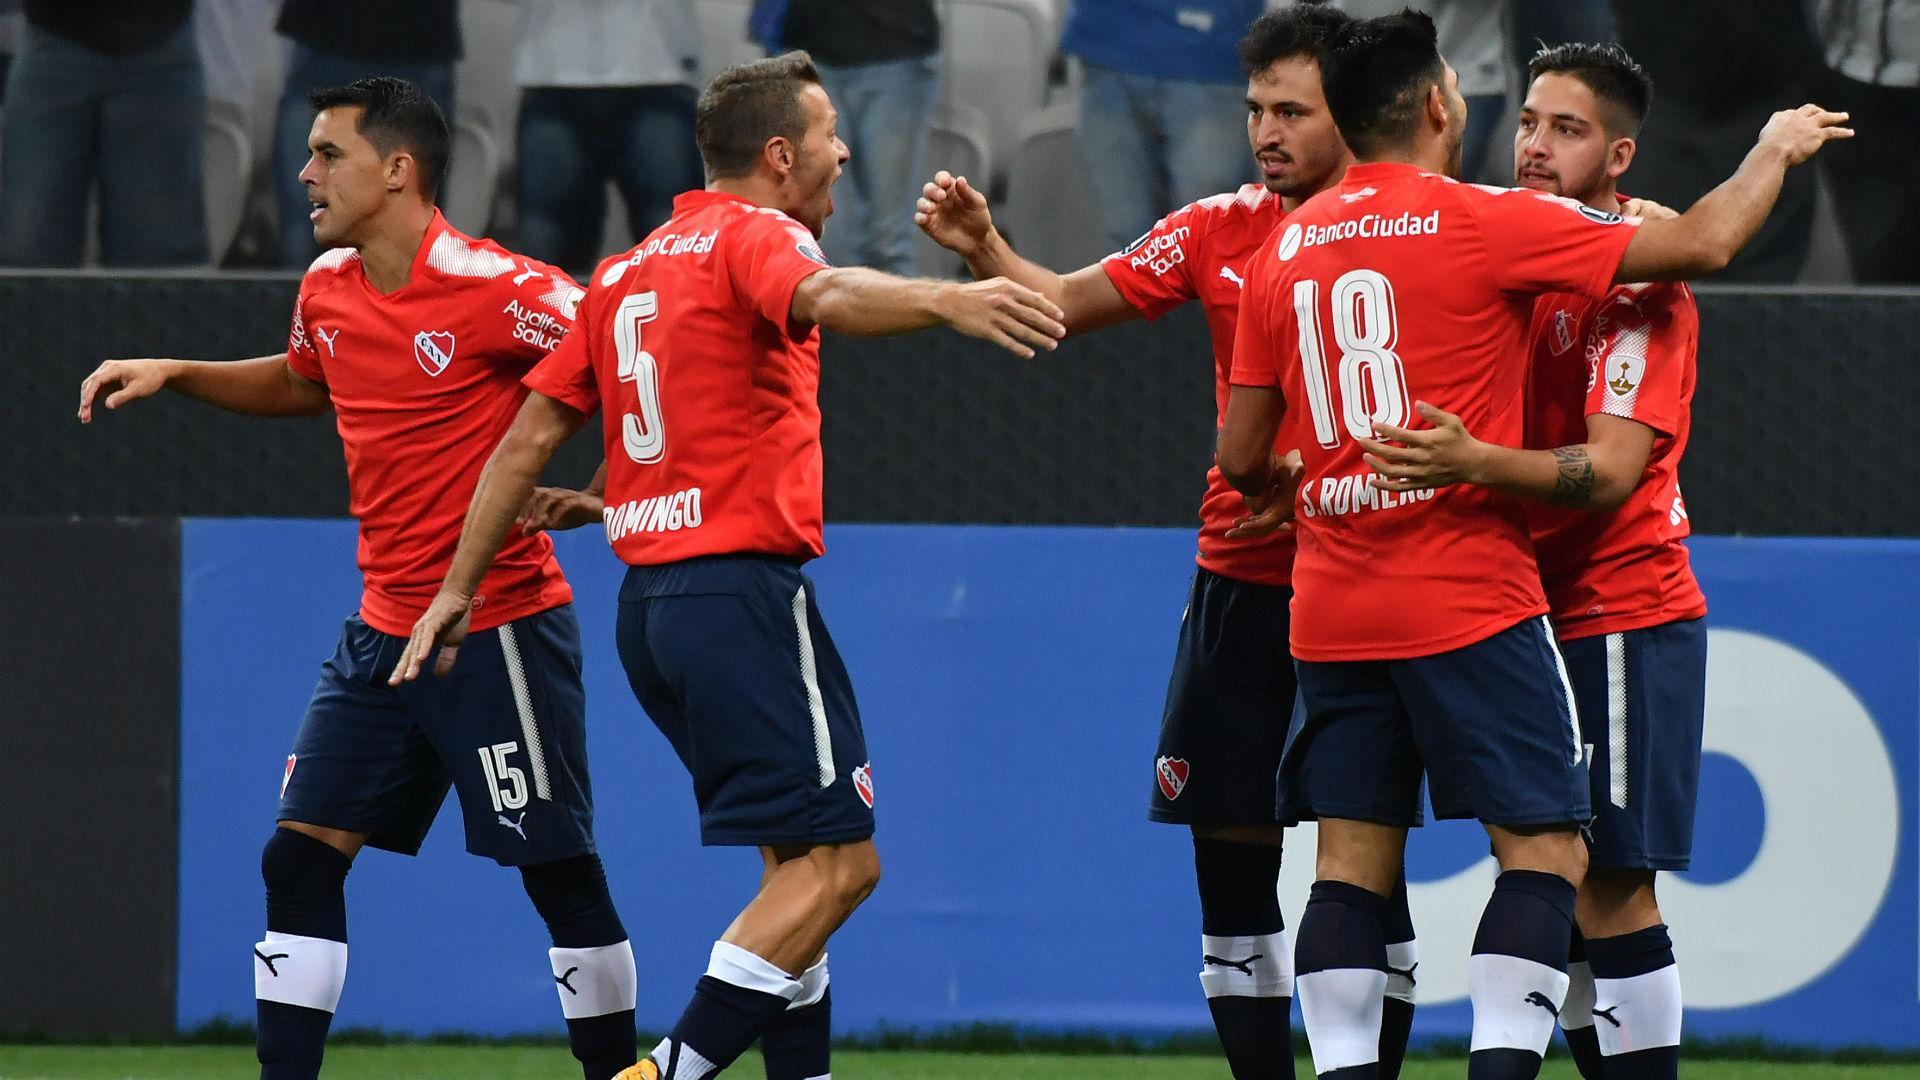 Corinthians Independiente Copa Libertadores 02052018